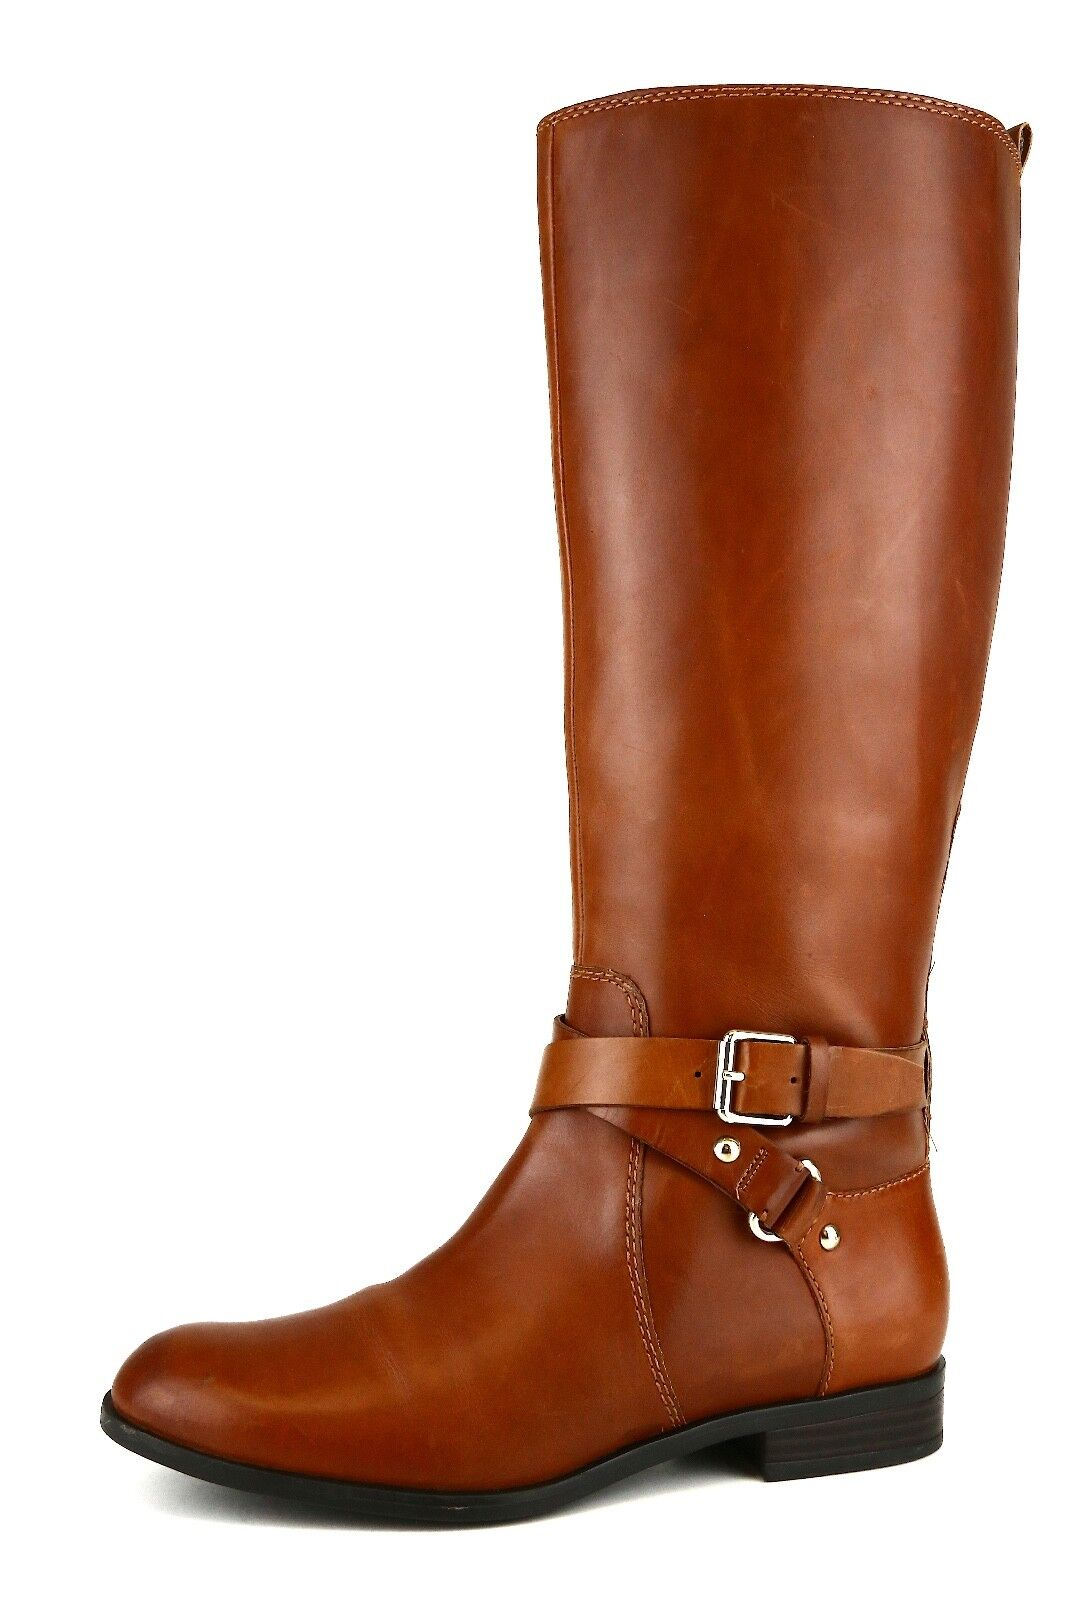 Enzo Angiolini Daniana Riding Leather Boot Brown Women Sz 8M 5267 *